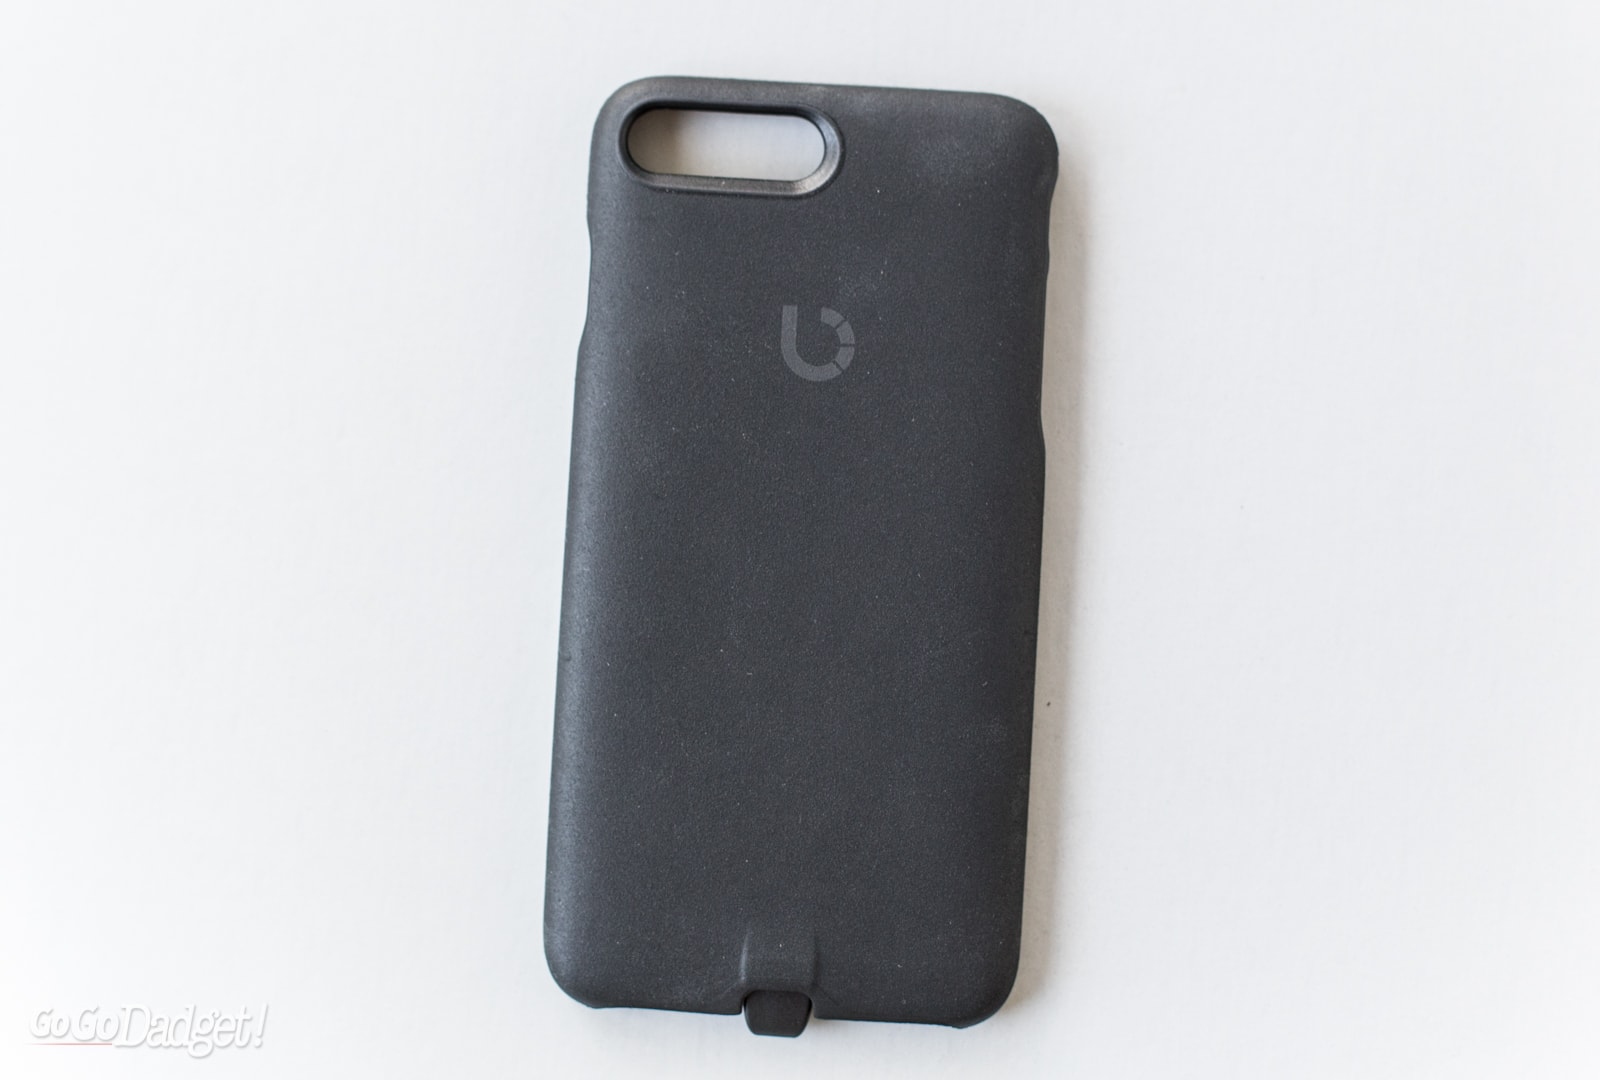 buy popular 703a3 0de0f Bezalel iPhone 7 Plus Latitude Wireless Charging Case Review